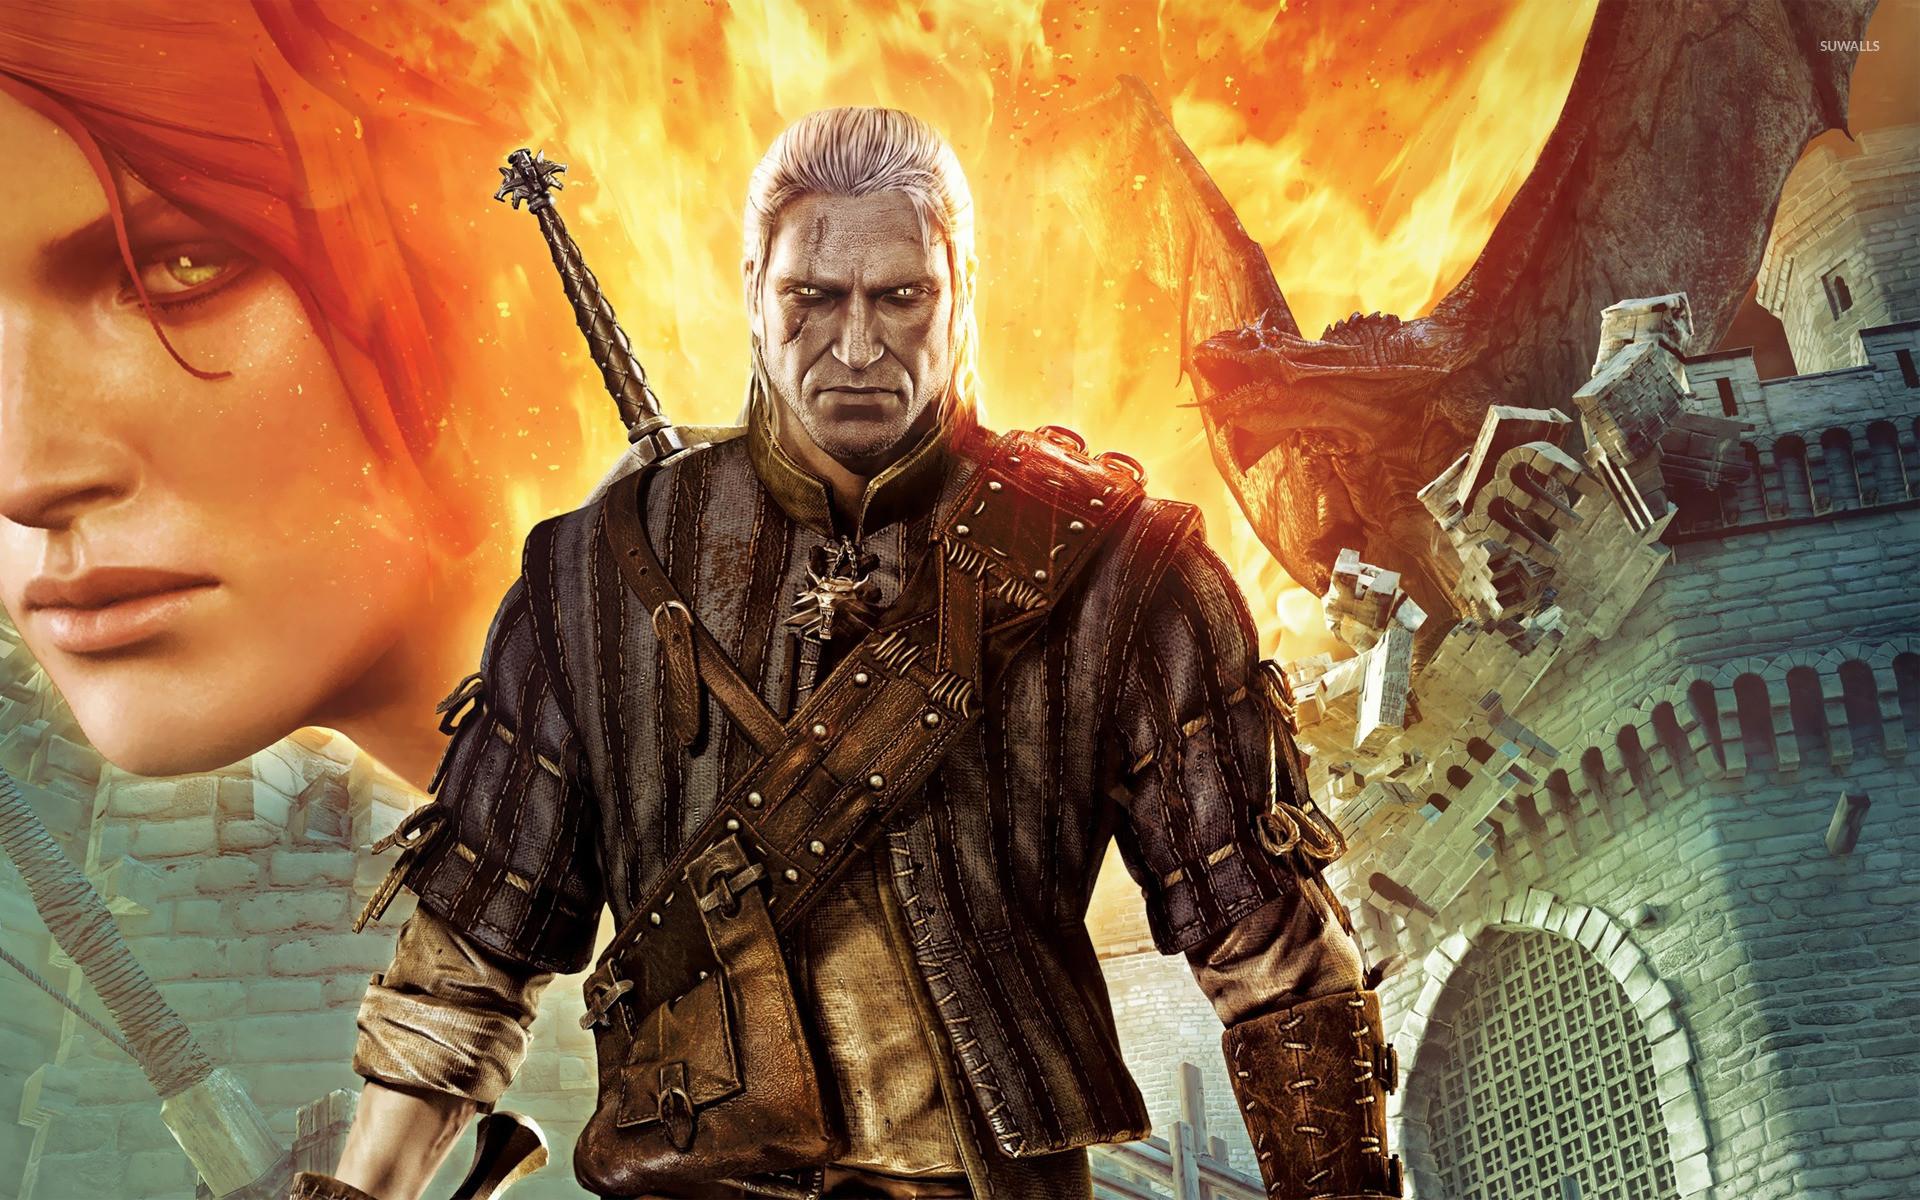 Triss Merigold and Geralt – The Witcher 2 wallpaper jpg